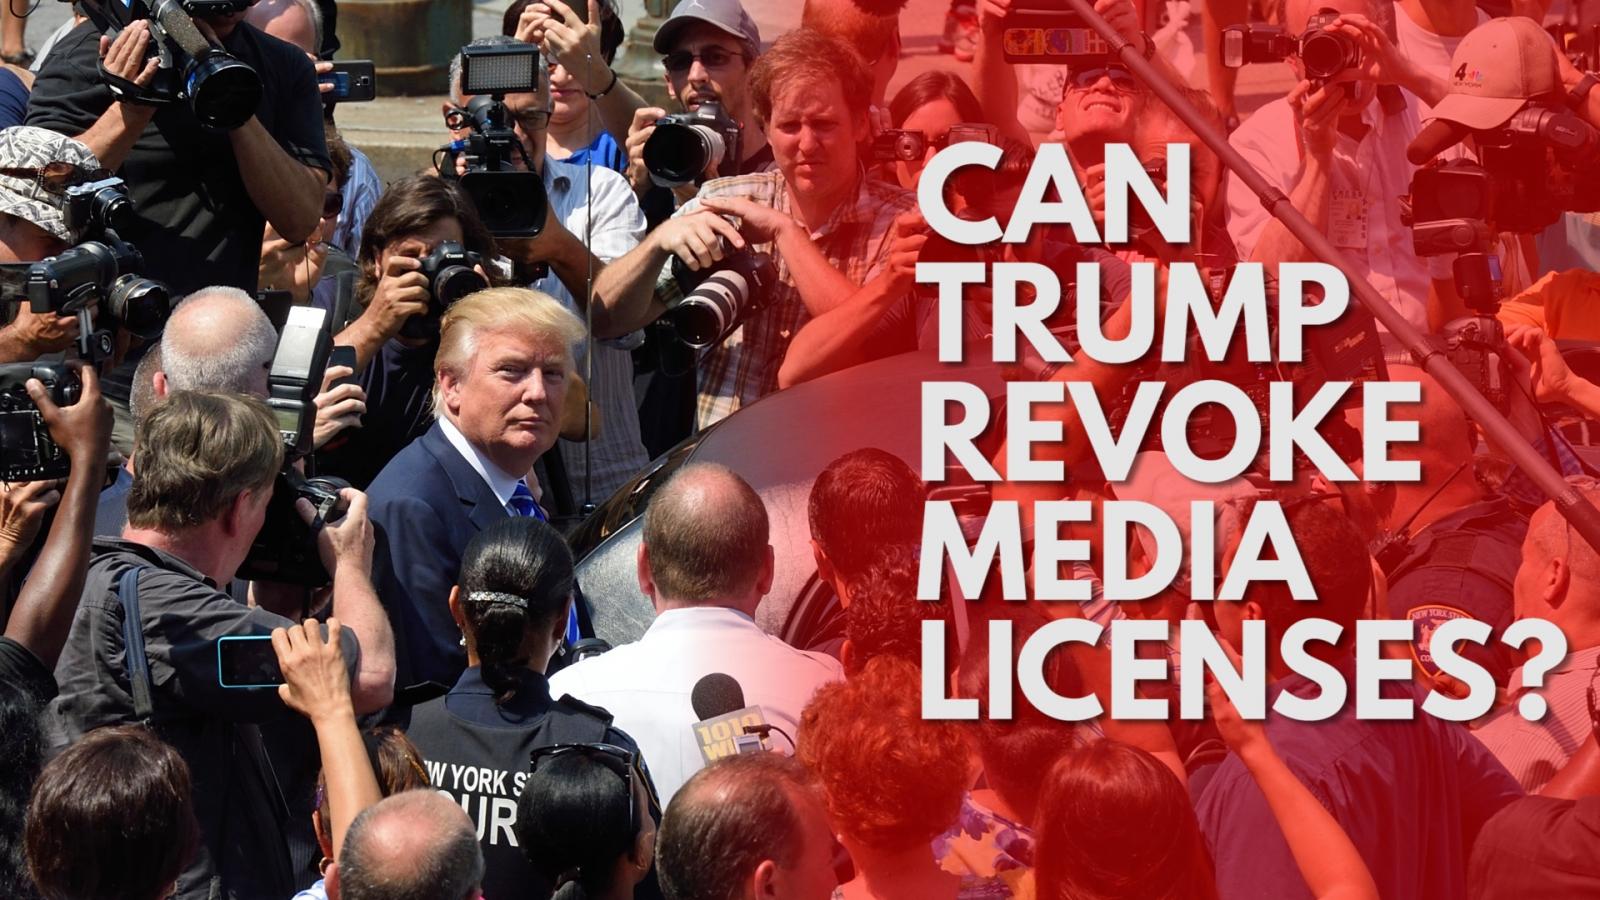 can-donald-trump-really-revoke-nbcs-media-license